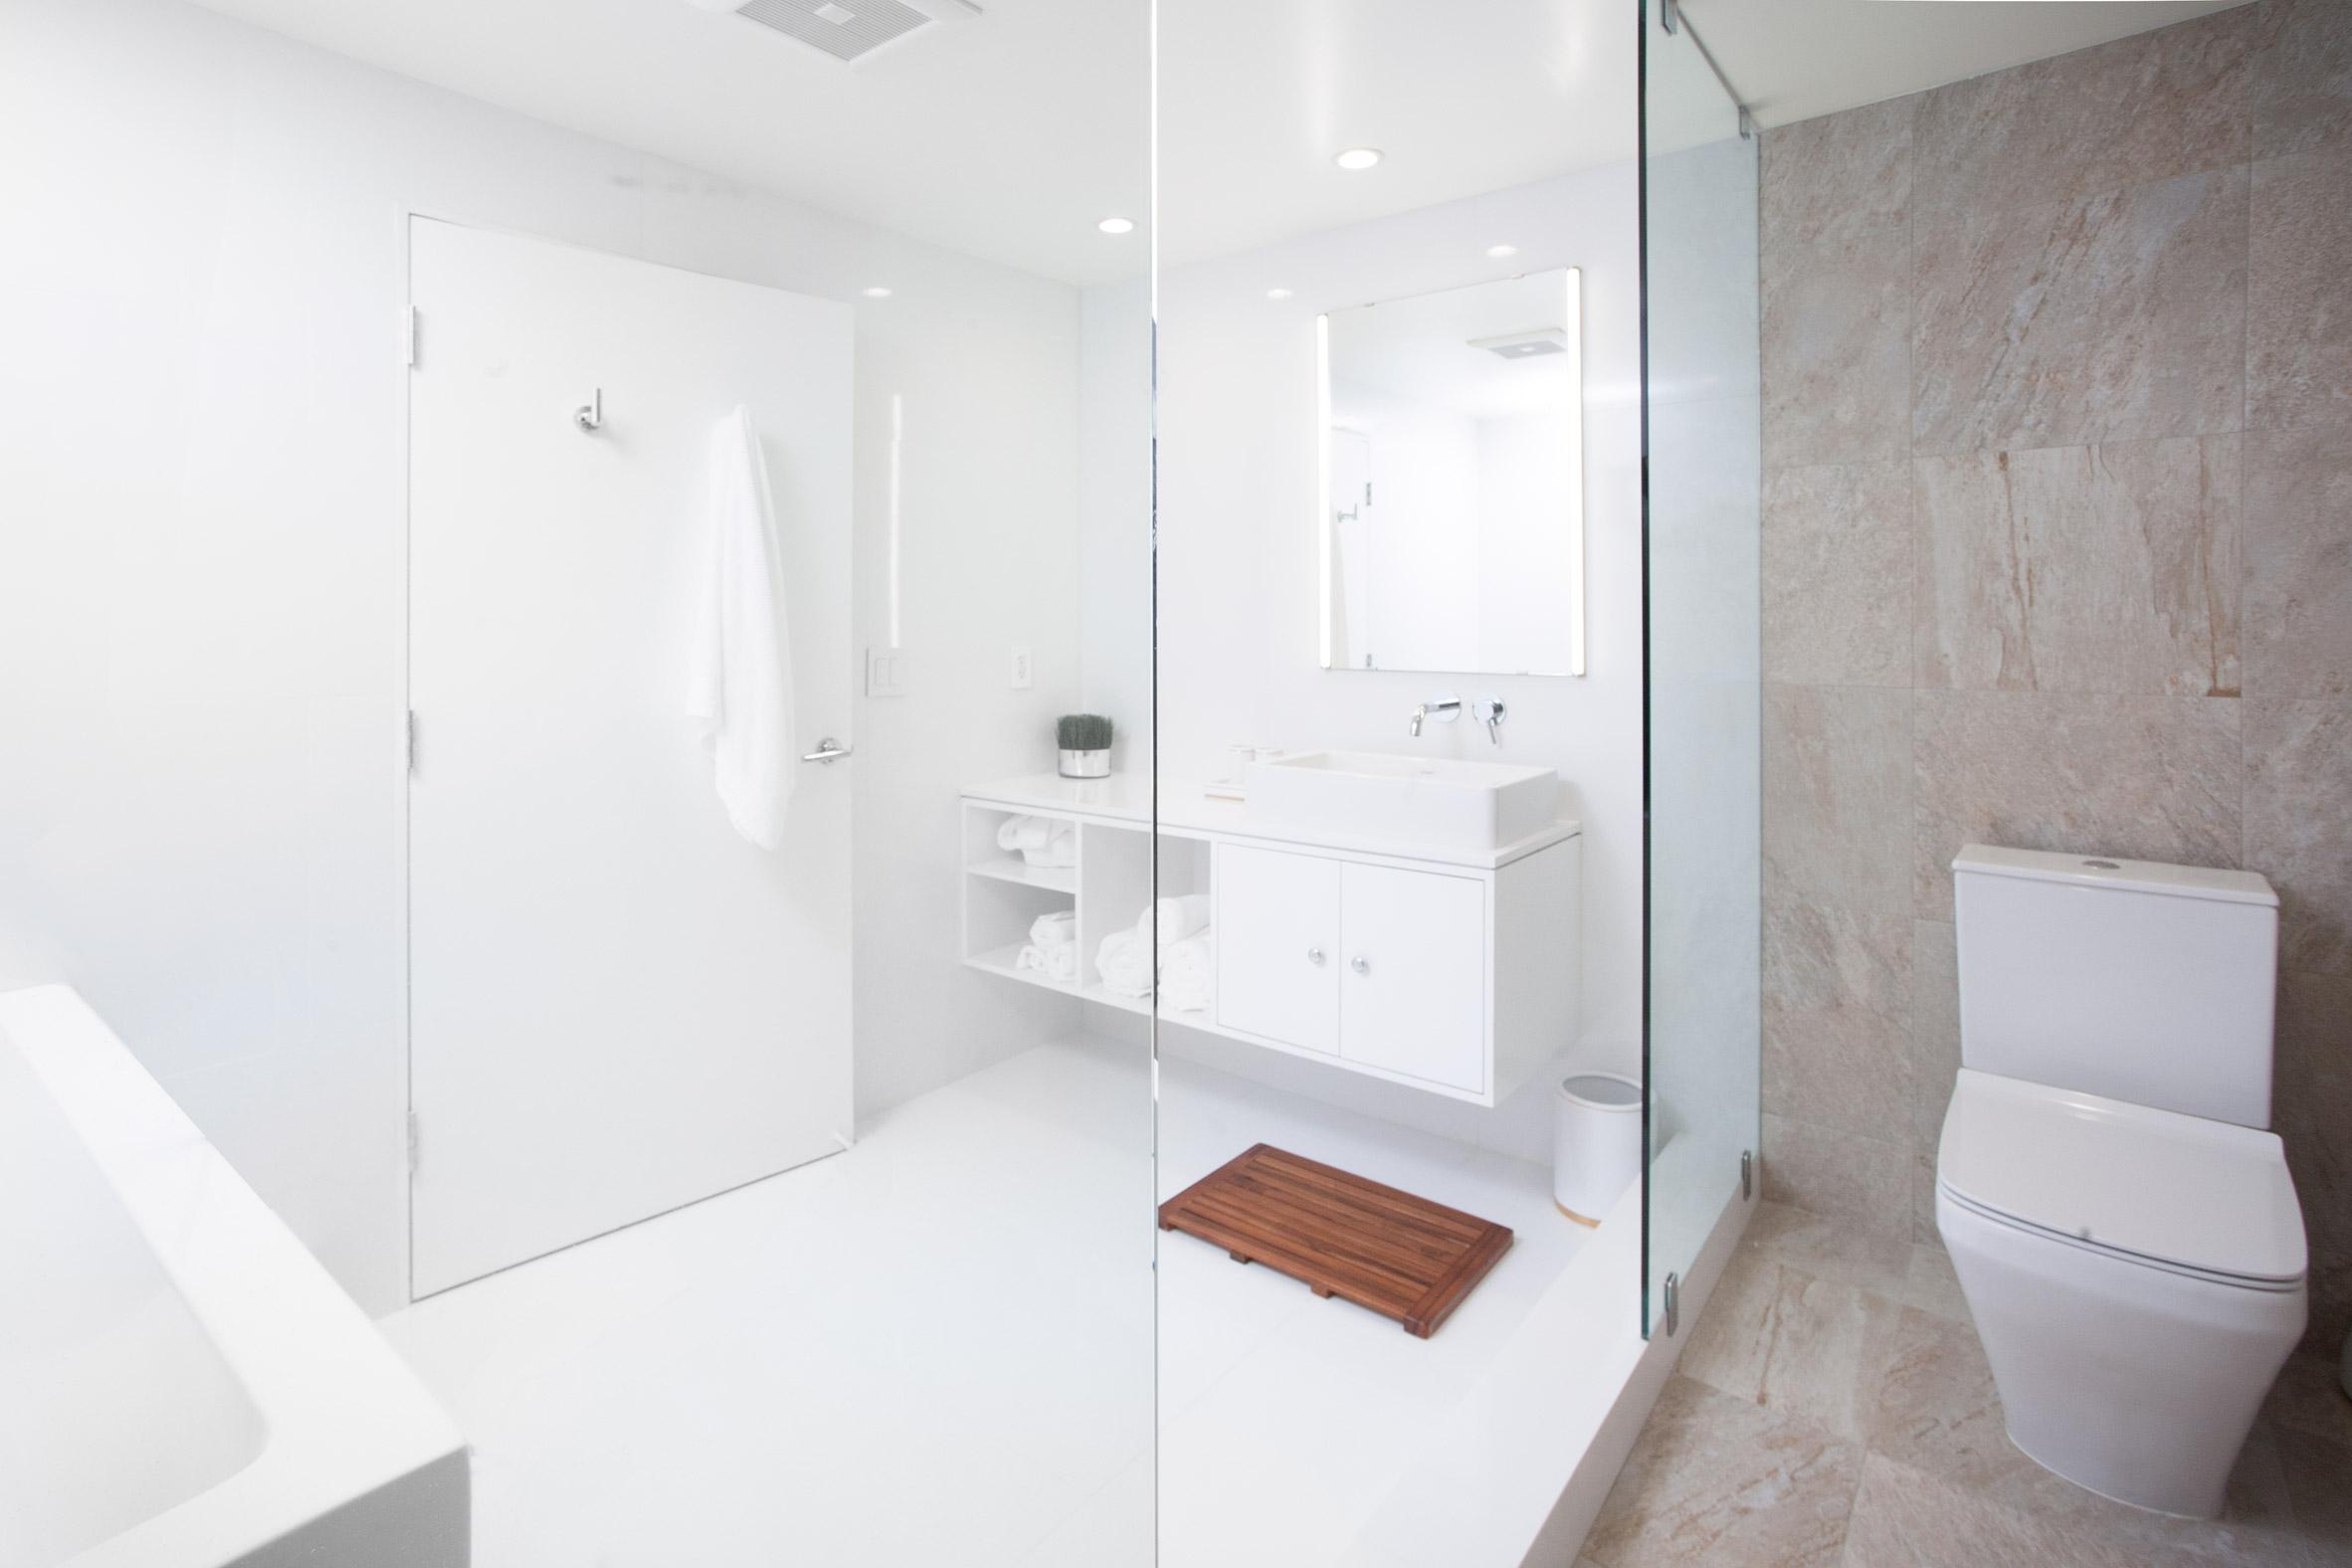 architecture-loft-interior-design-studia-osnovadesign-osnova-poltava_07